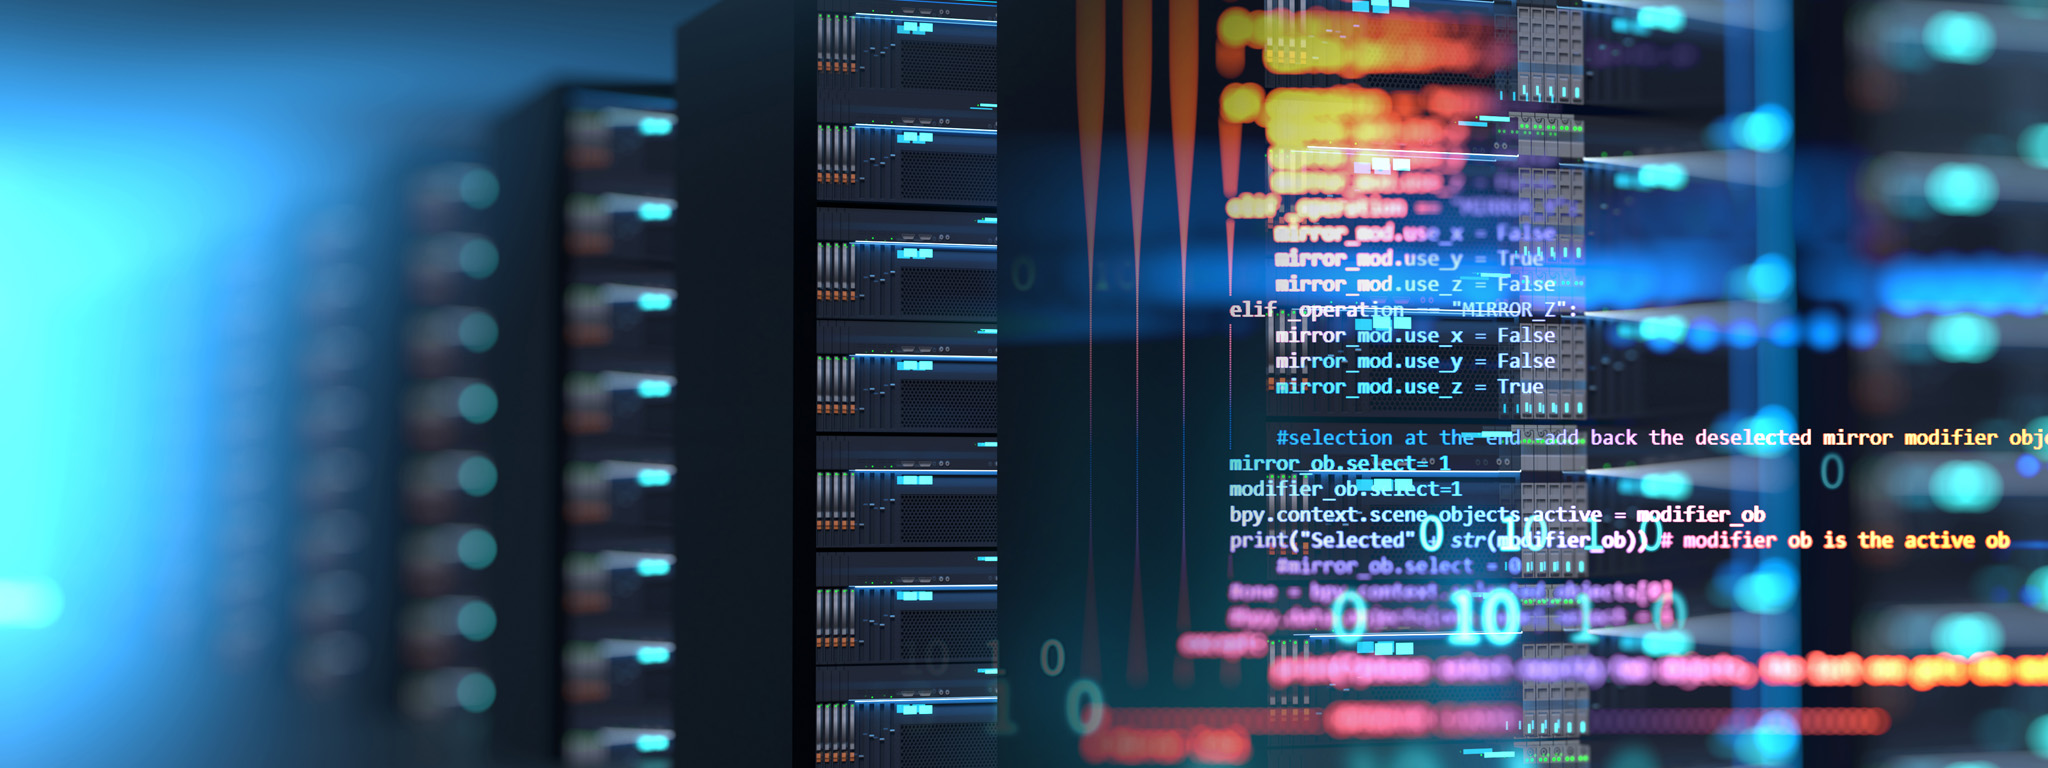 Fokus pada barisan rak server yang dihiasi kode komputer berwarna-warni